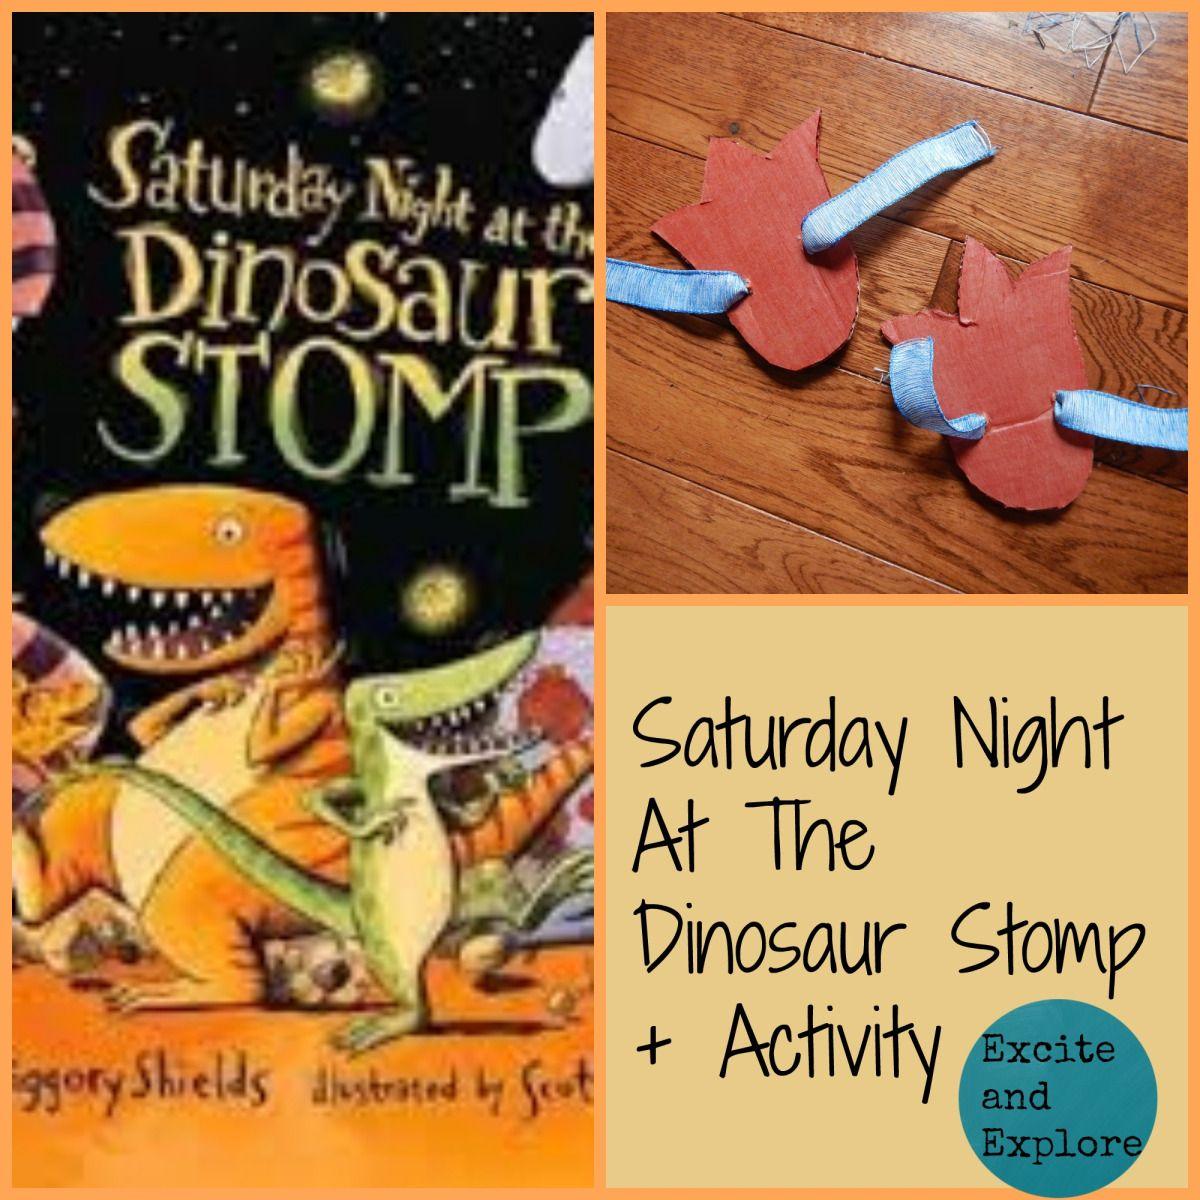 Saturday Night At The Dinosaur Stomp Activity